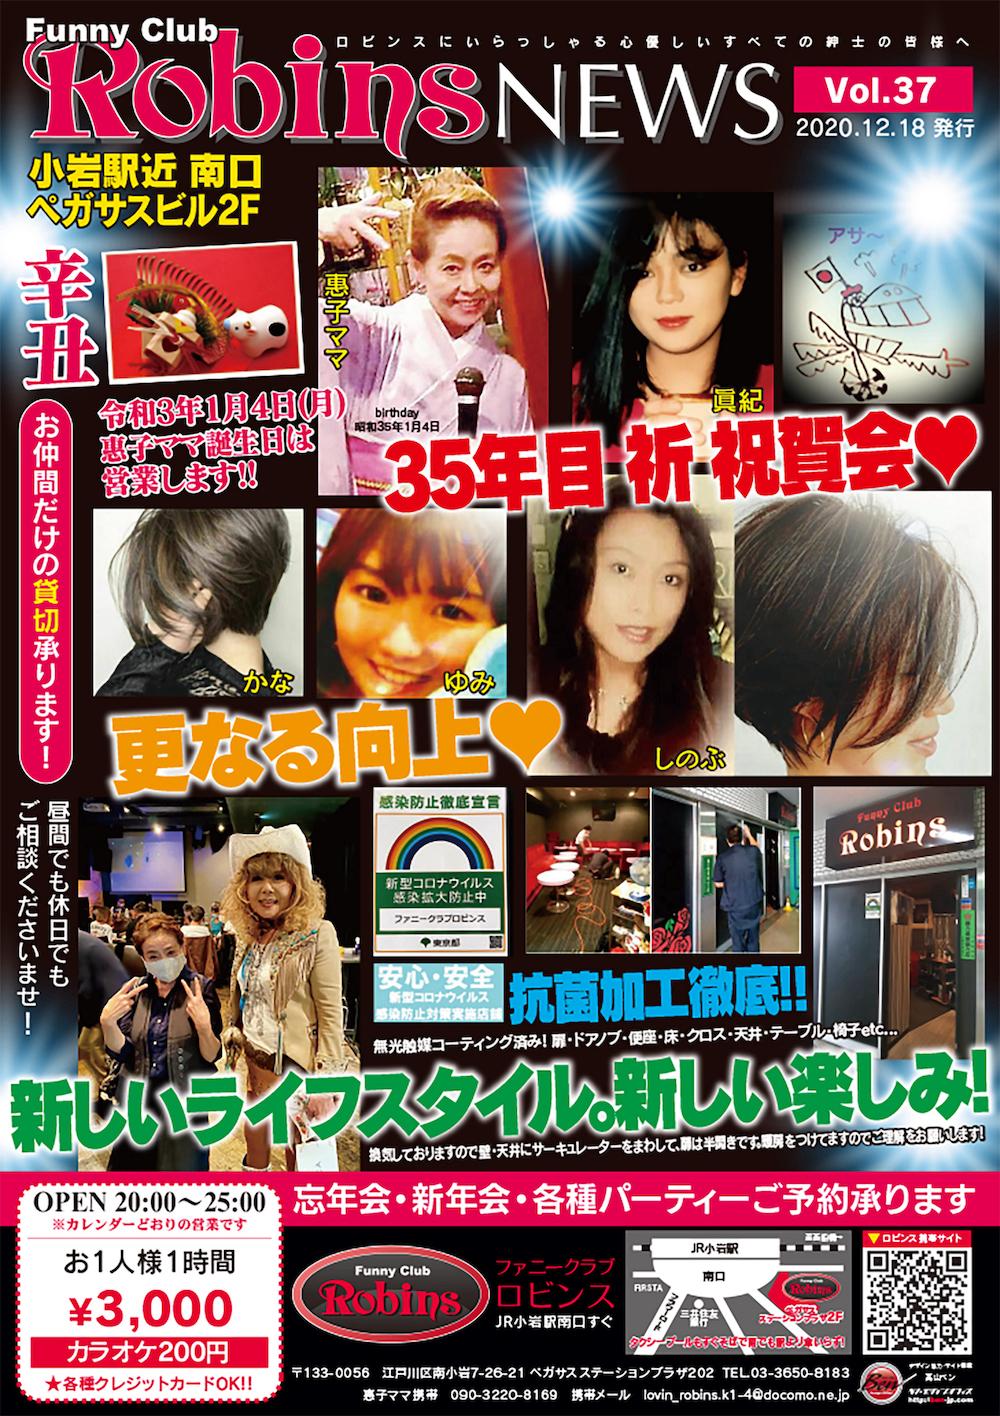 robins_news_37.jpg